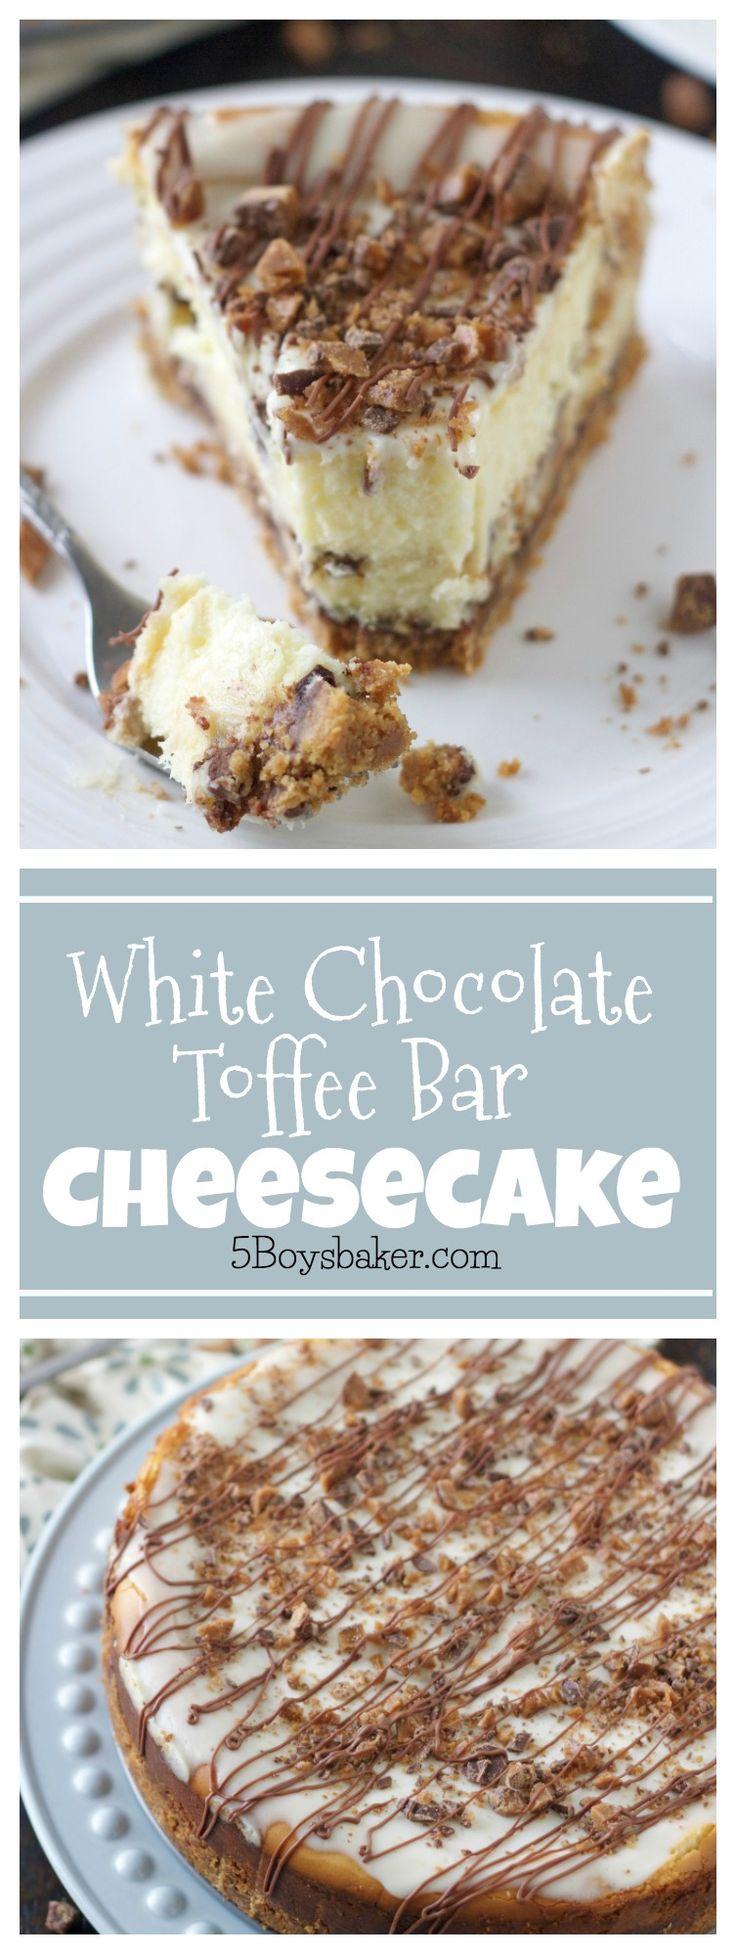 White Chocolate Toffee Bar Cheesecake {12 Days of Sugar – Day 8}